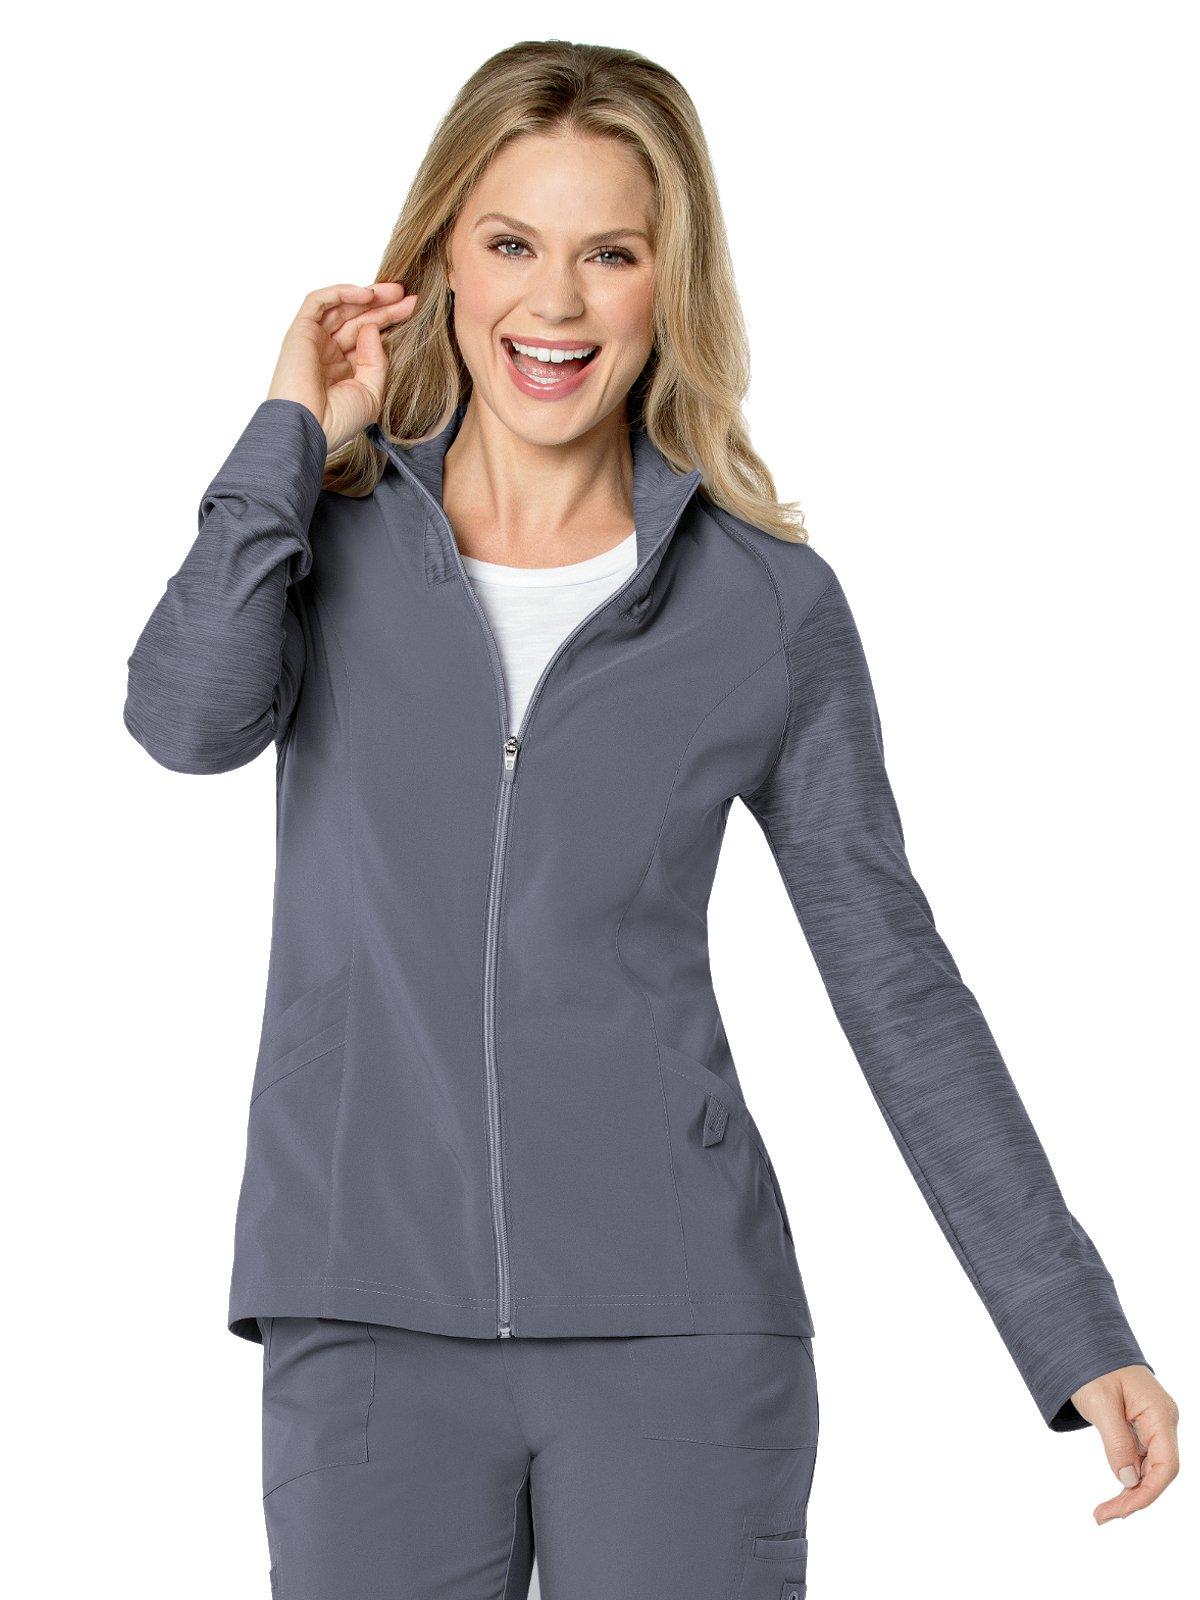 Urbane Performance 9876 Women's Modern Fit Quick Cool Crossover Zip Scrub Jacket Steel S by Landau